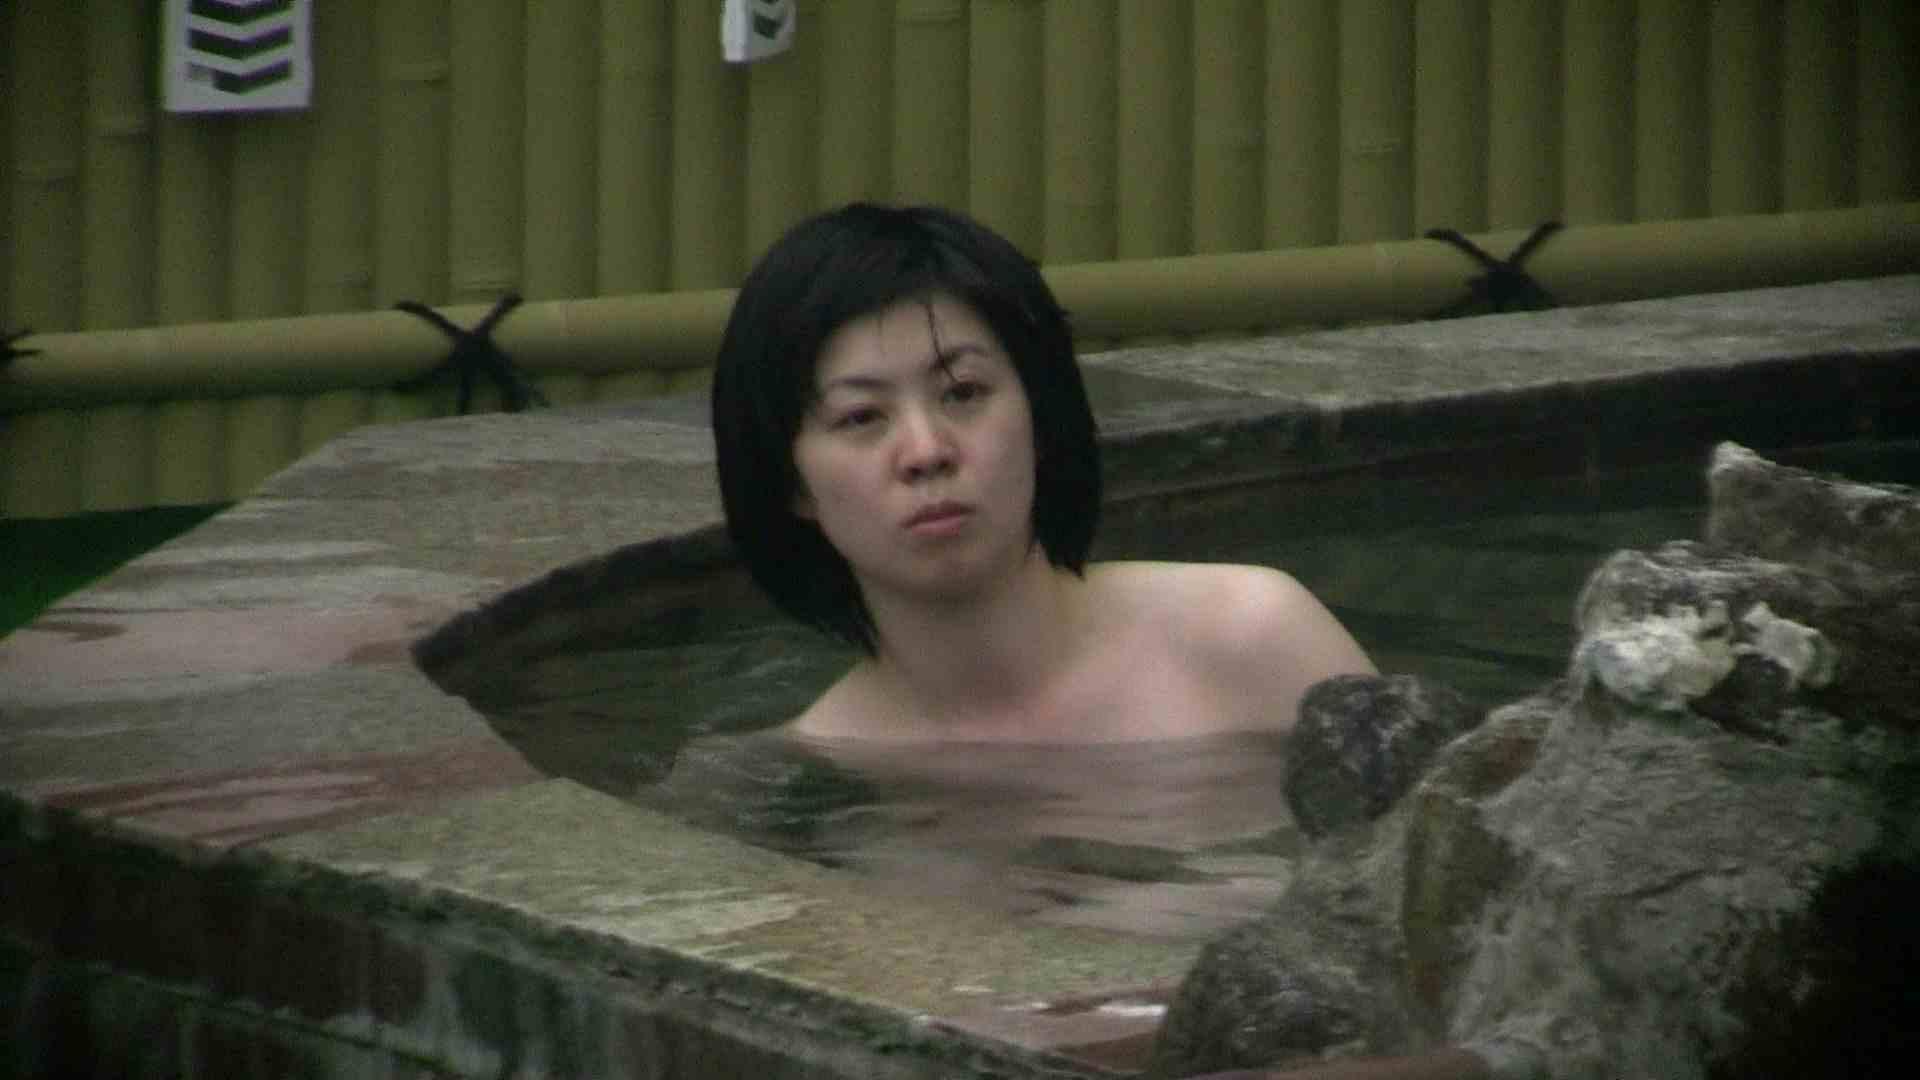 Aquaな露天風呂Vol.685 OLのプライベート   盗撮特撮  13pic 10